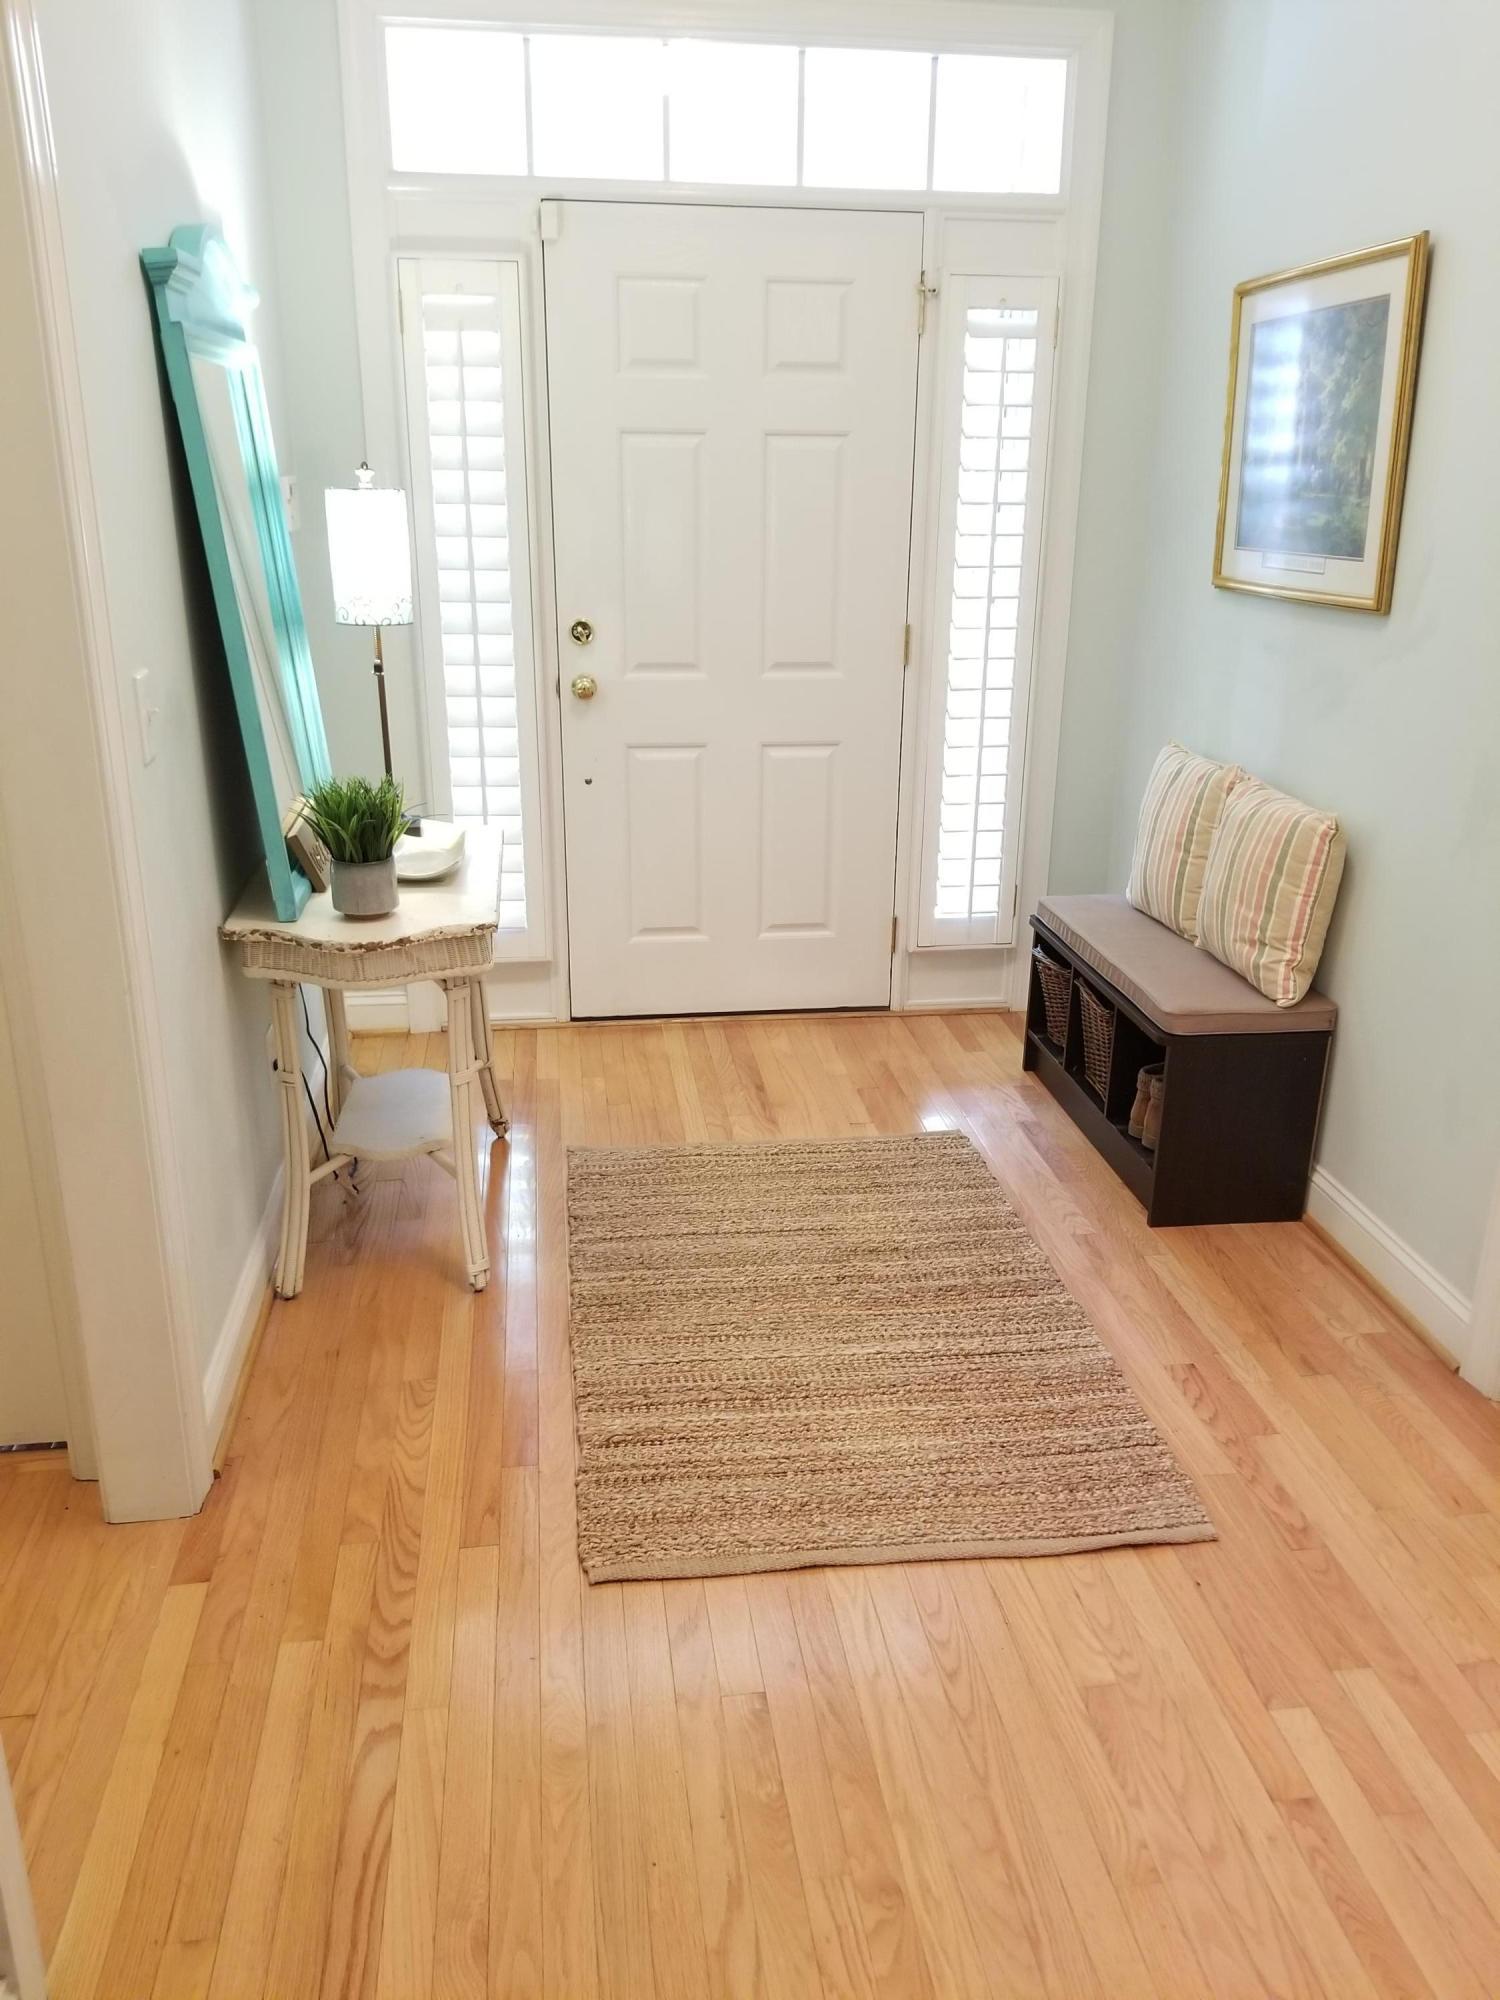 Daniel Island Homes For Sale - 1013 Barfield, Charleston, SC - 17